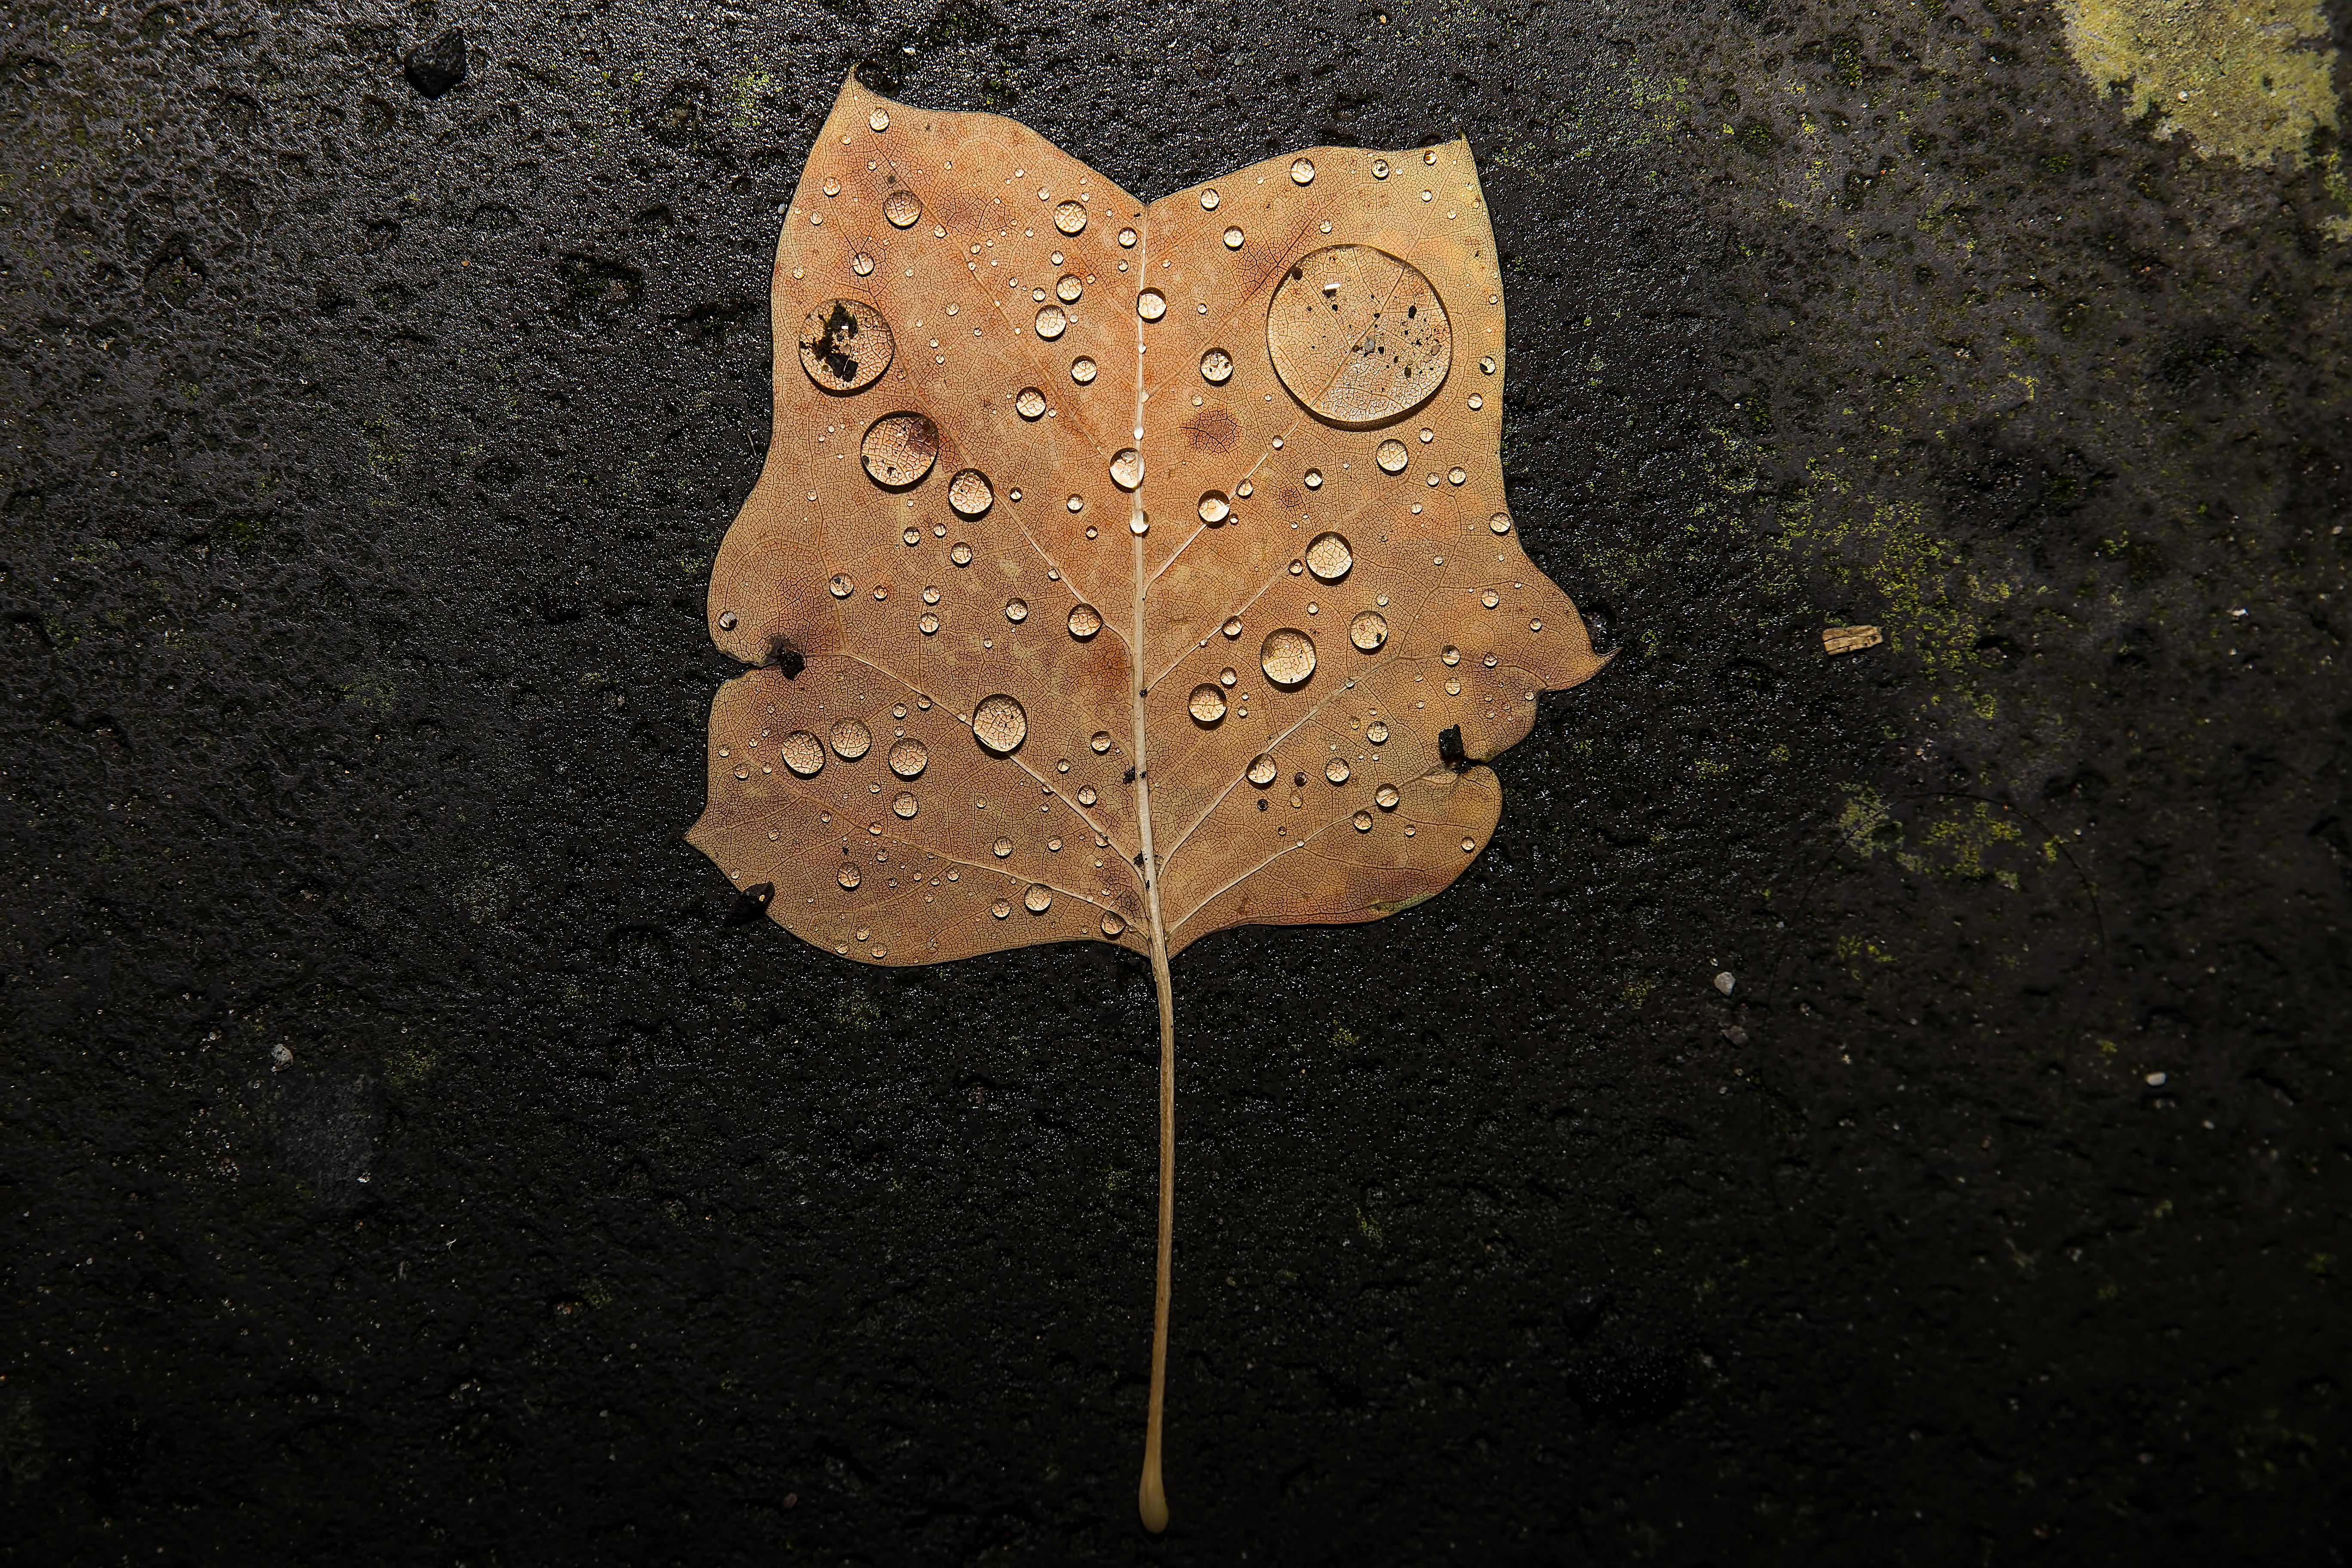 Autumn and the rain